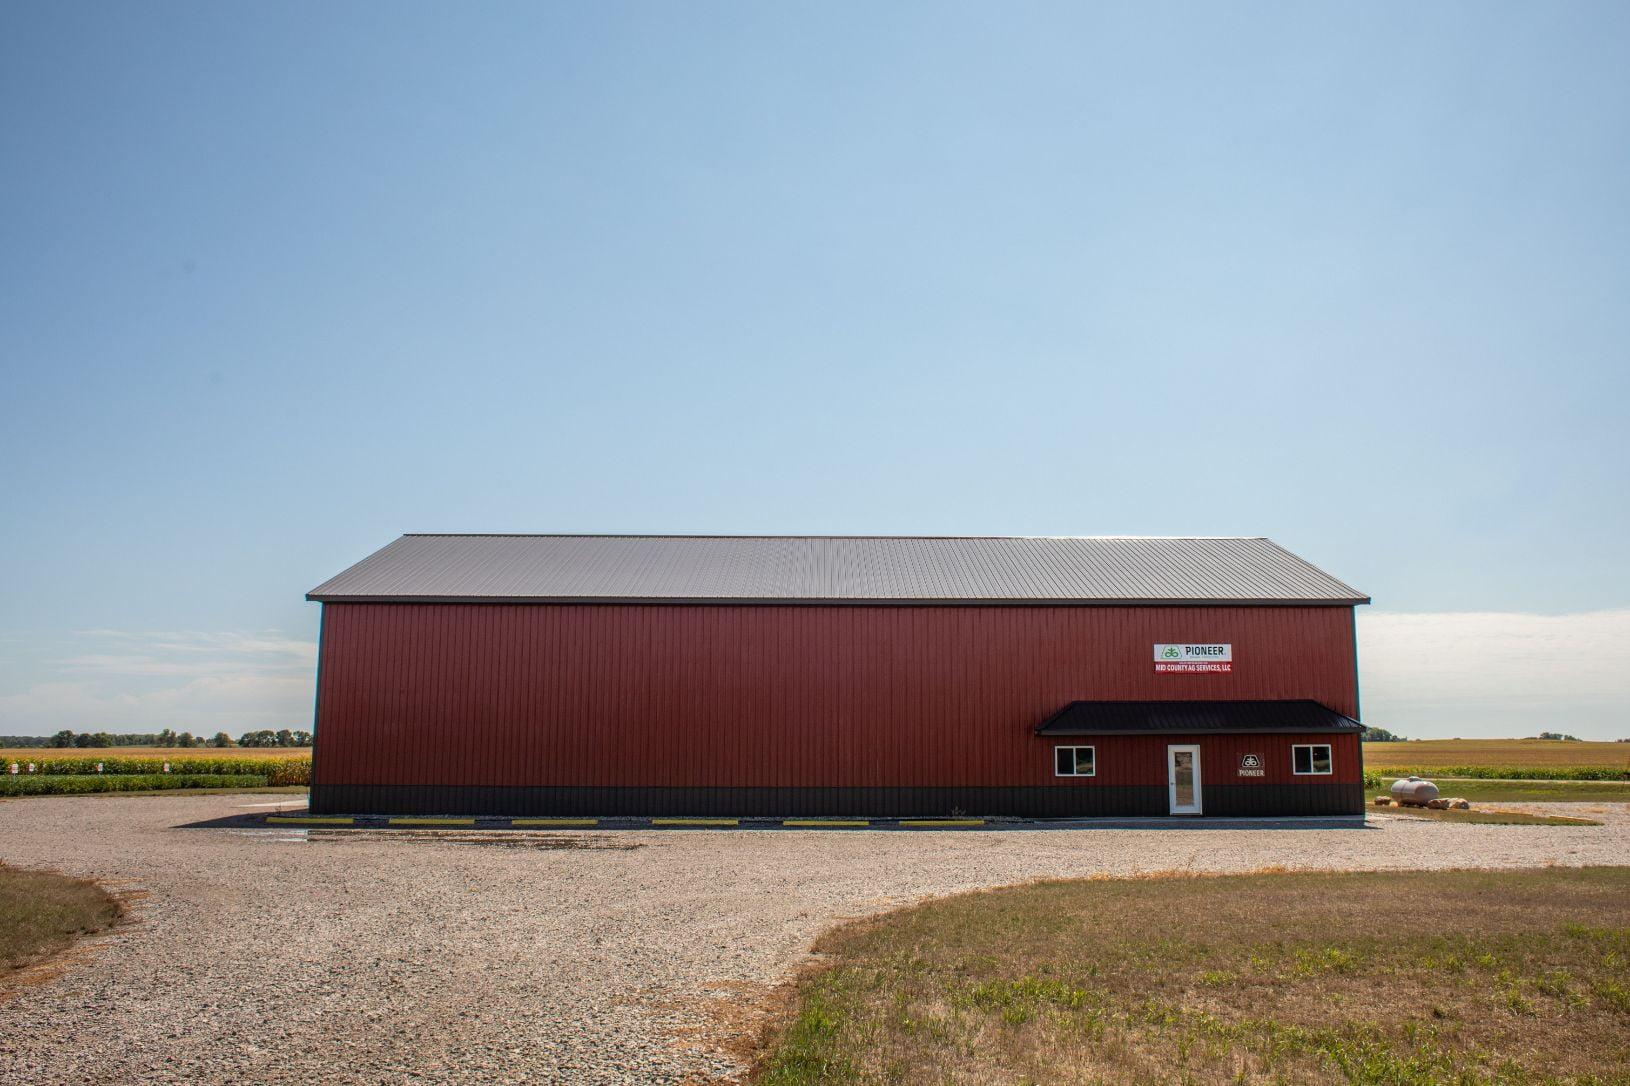 Shops & Storage Building 3